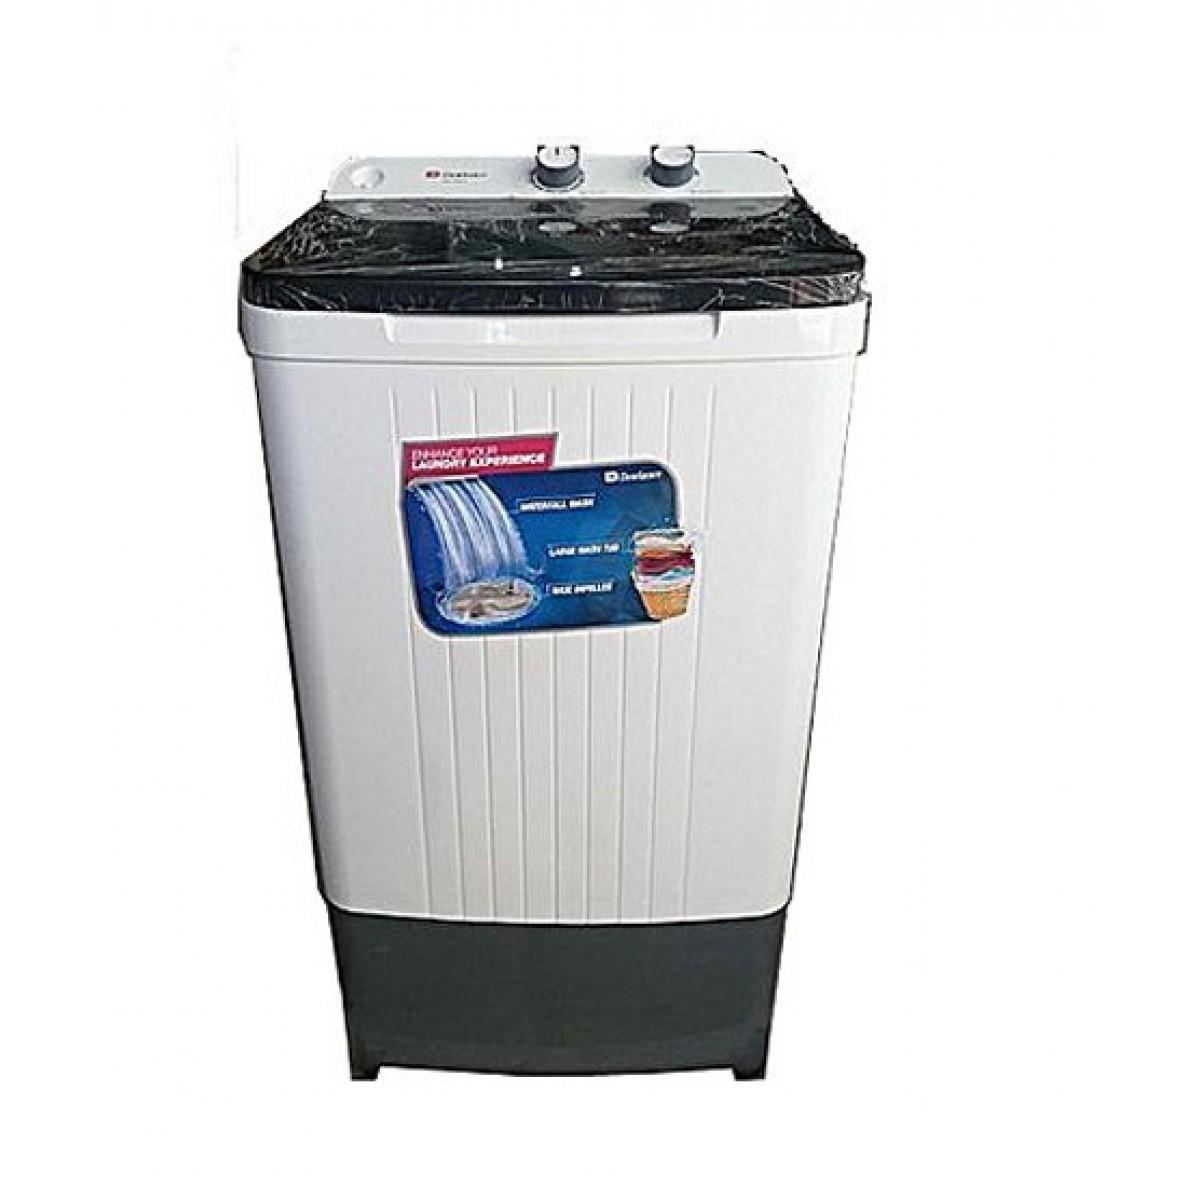 Dawlance DW-9100C Single Tub Washing Machine